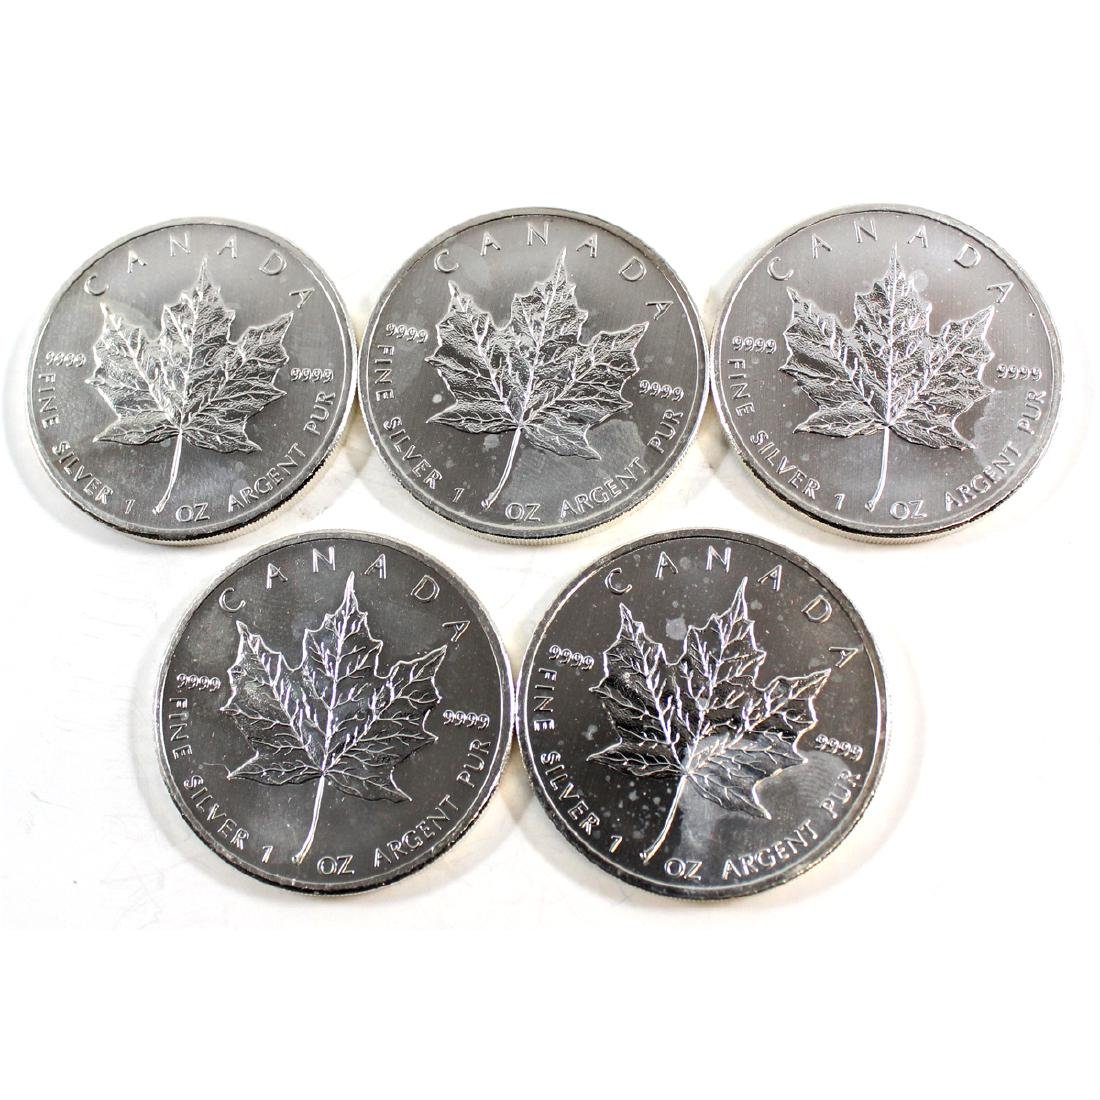 5x 2011 Canada 1oz Silver Maple Leaf Coins (Tax Exempt)